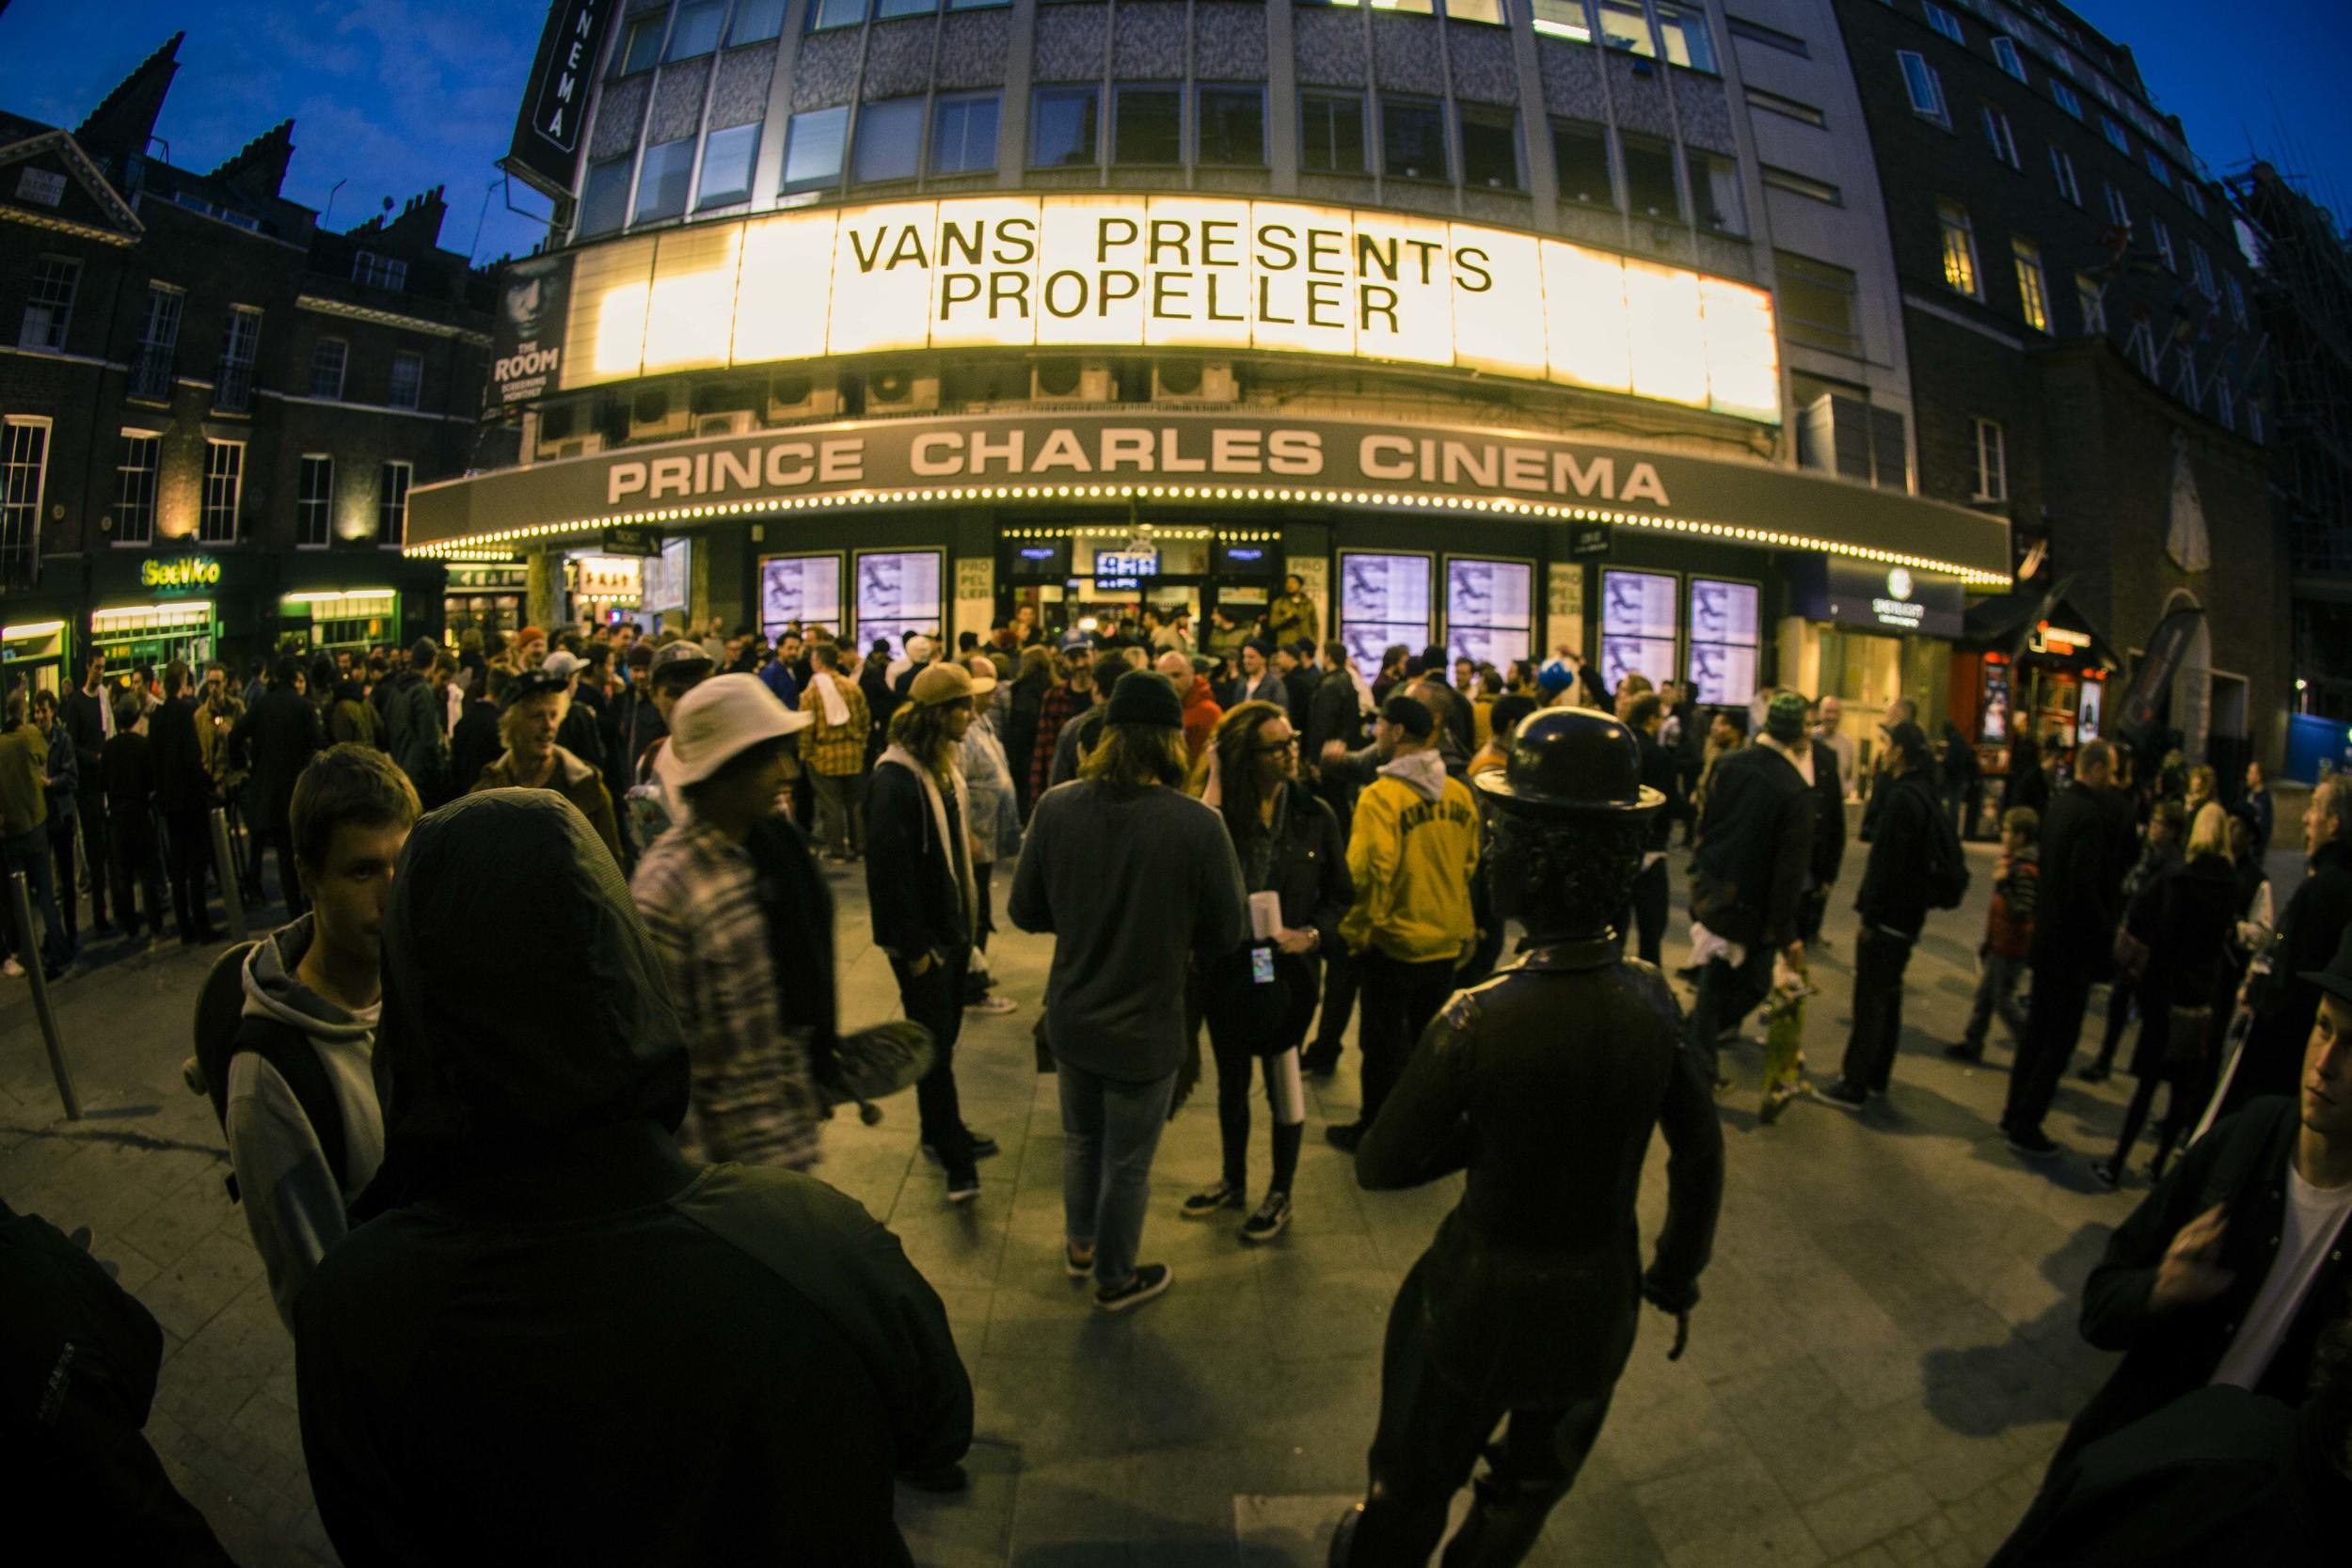 Prince Charles Cinema, London